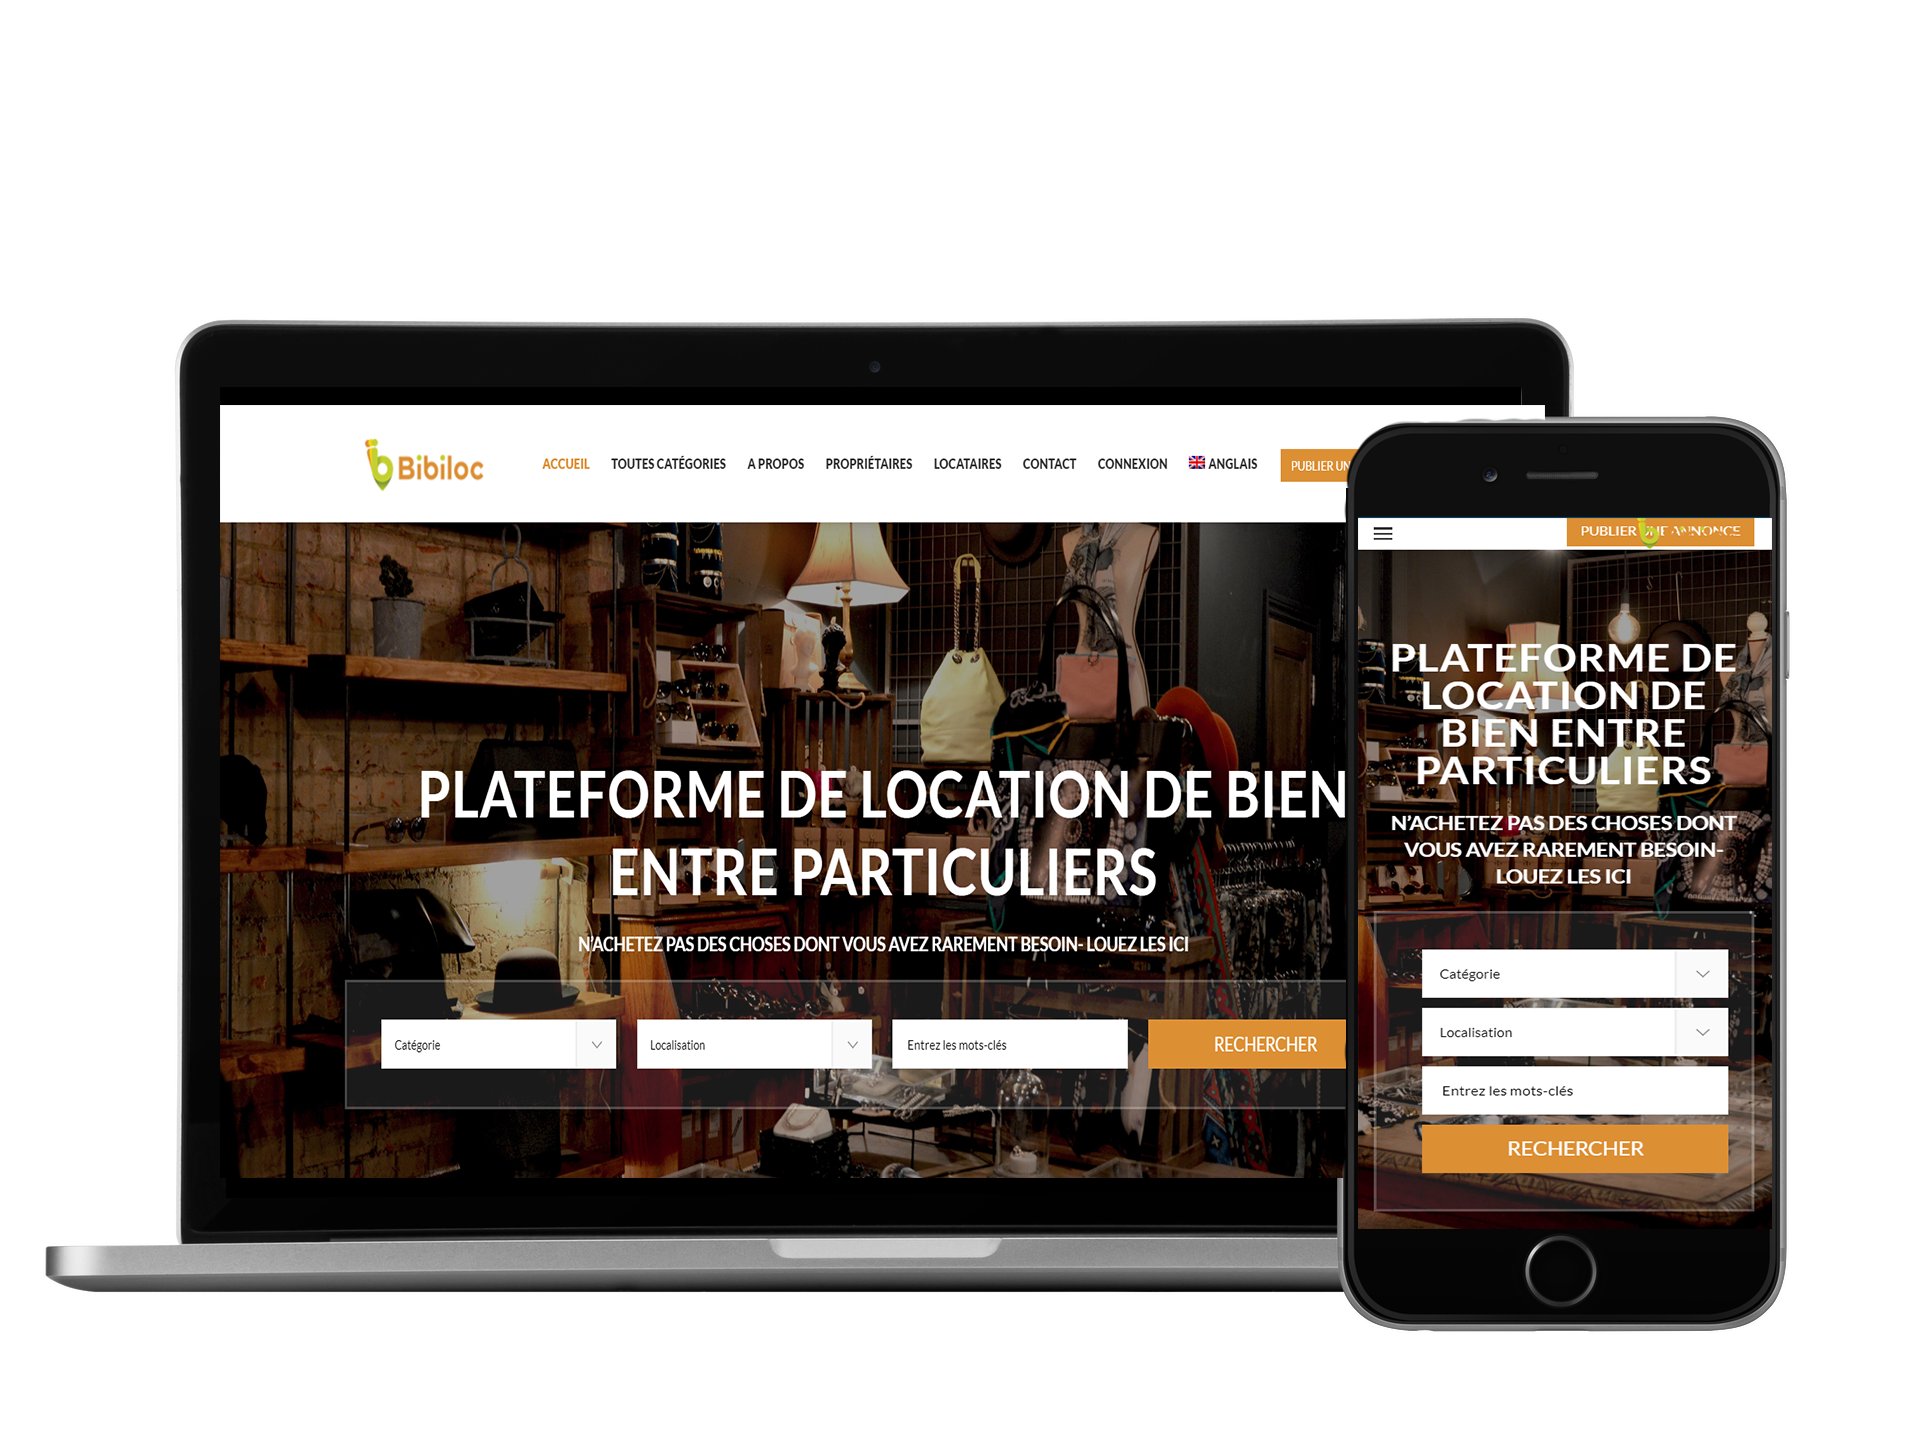 bibiloc site web